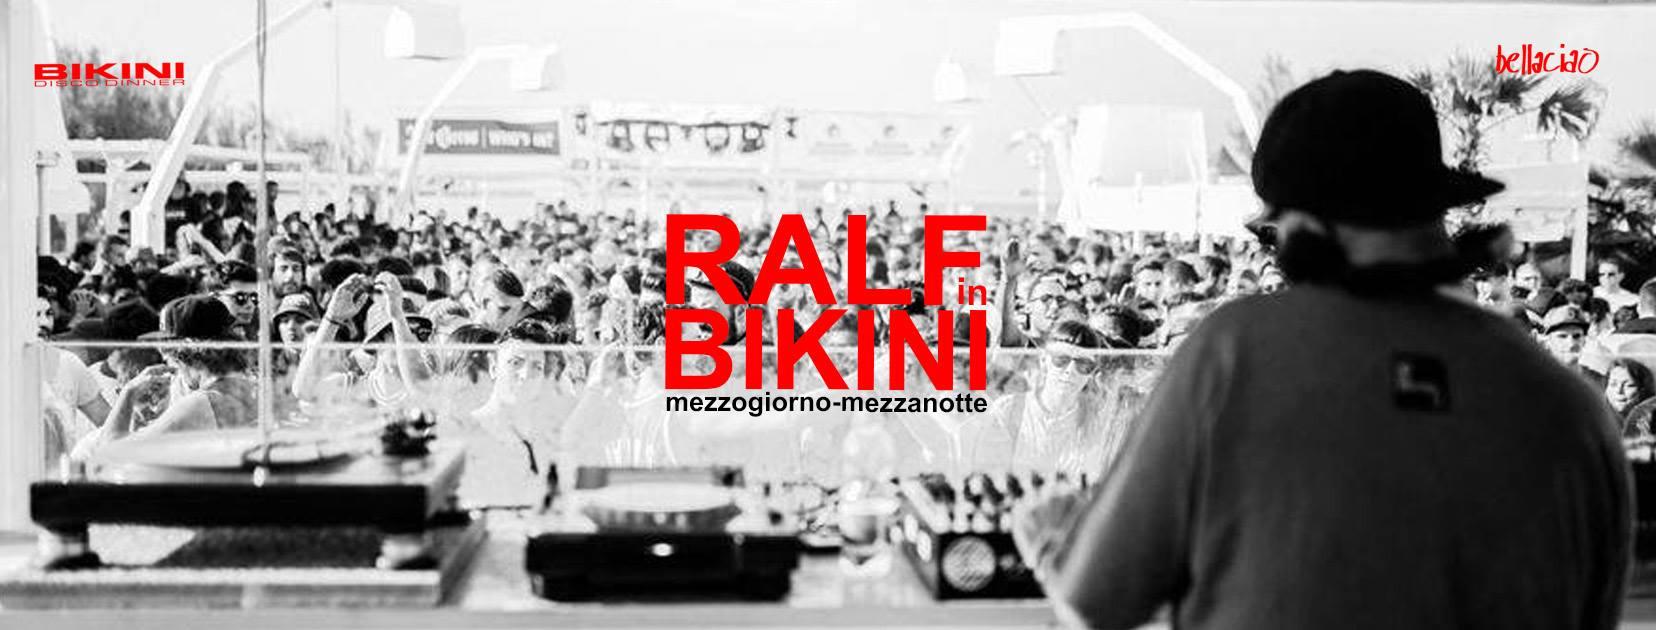 RALF IN BIKINI 2017 – DATE – INFO